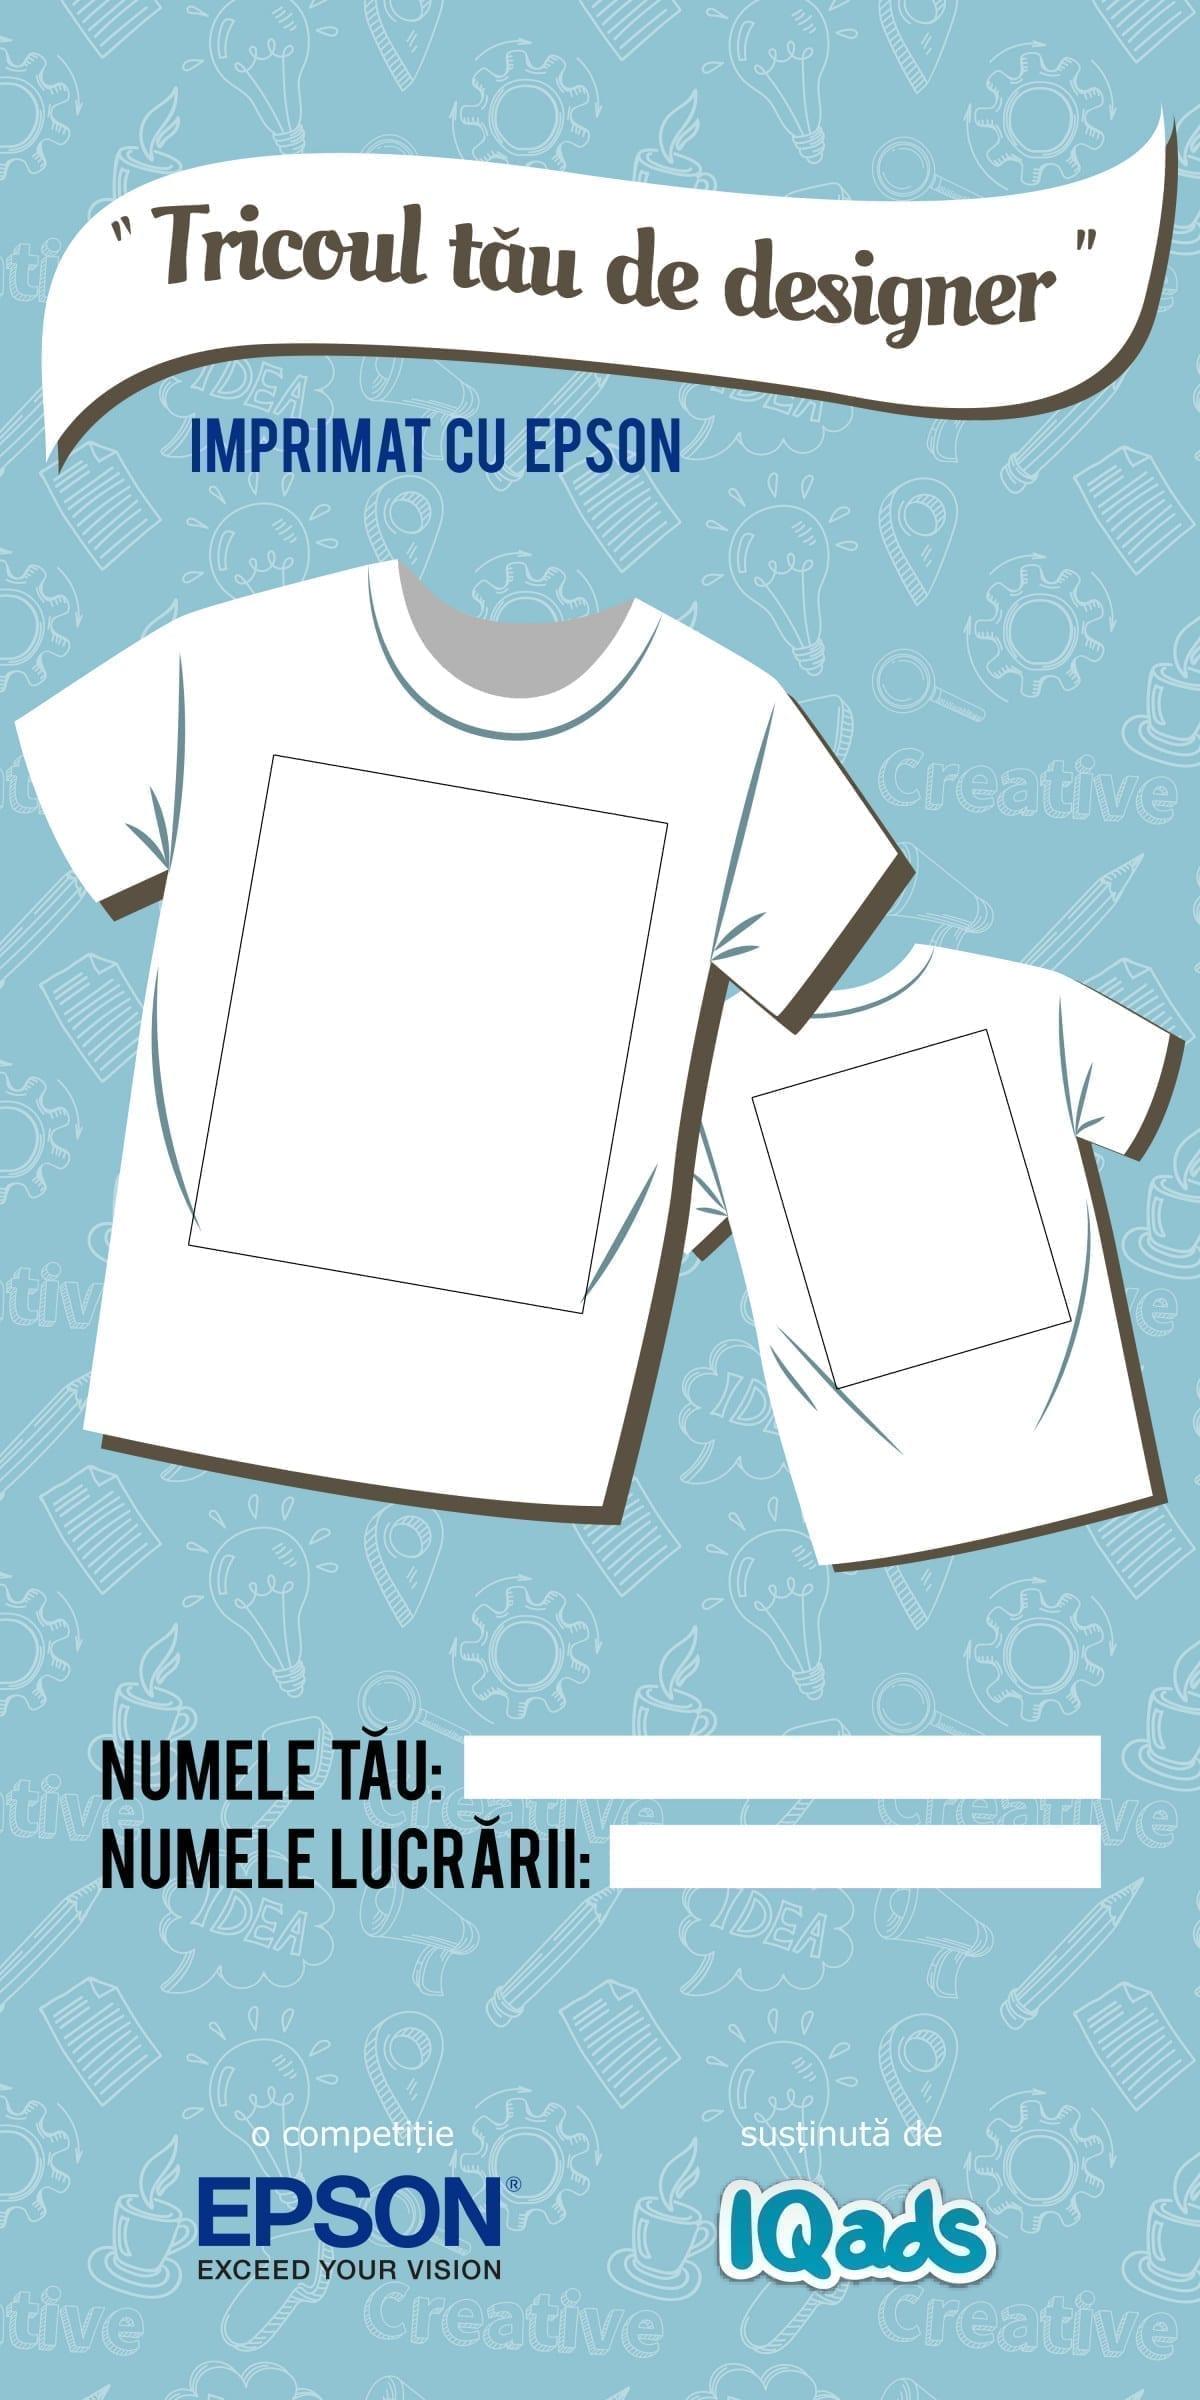 tricou de designer epson iqads 2